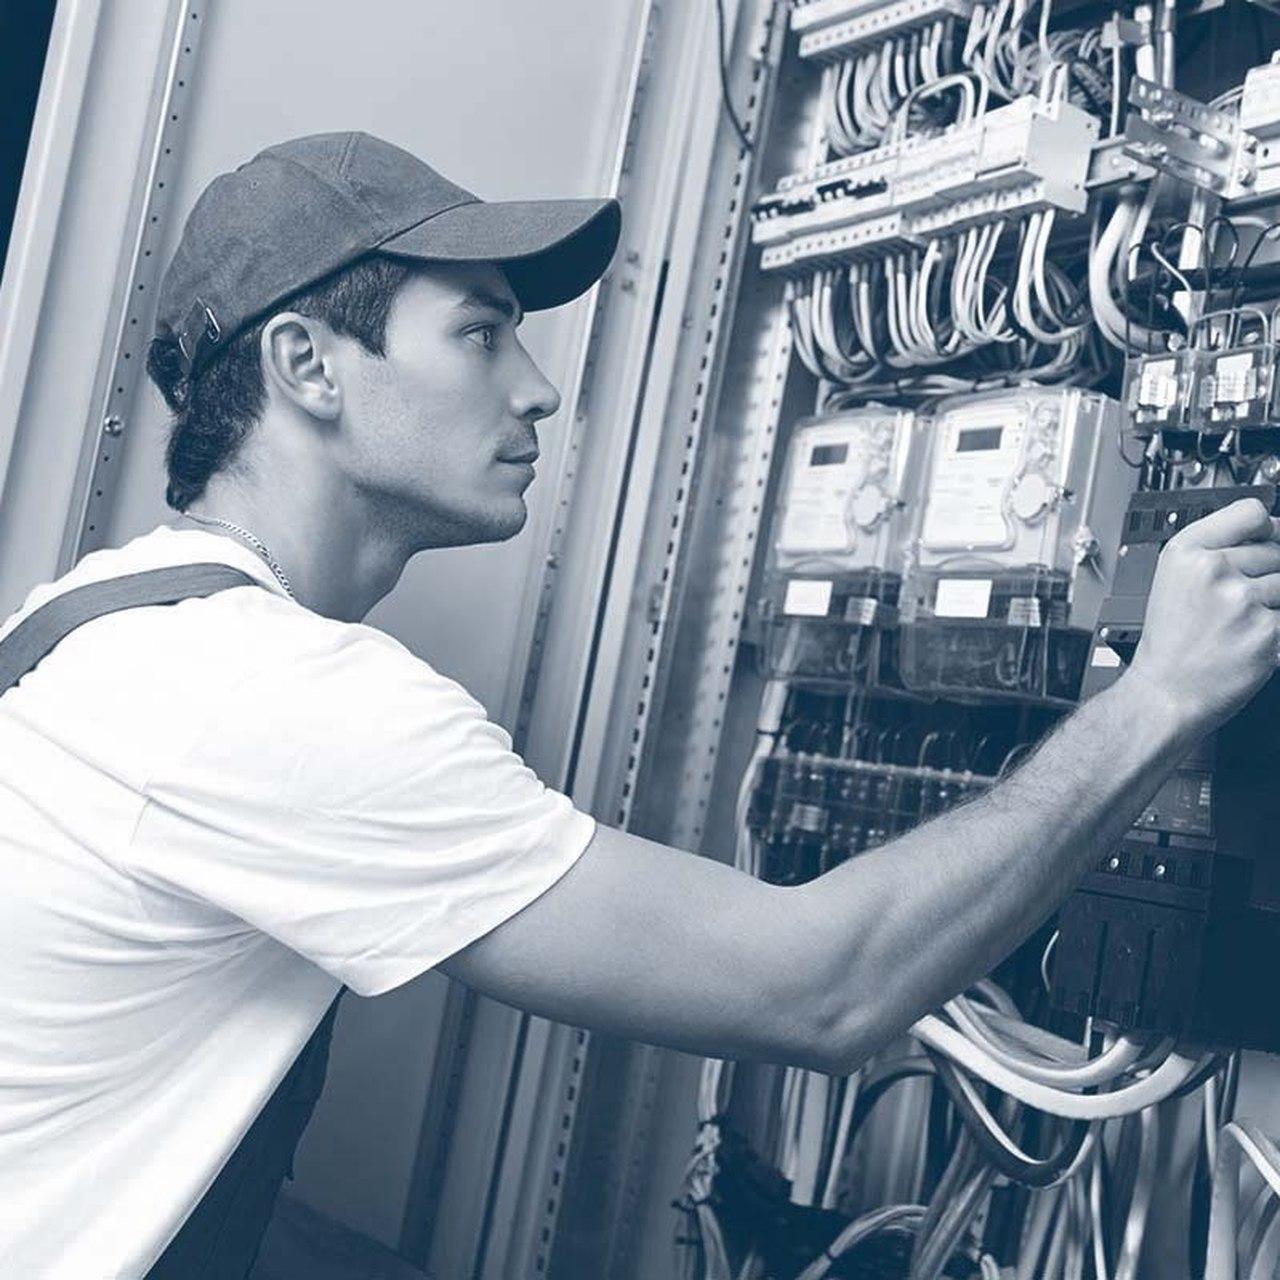 10 electricians